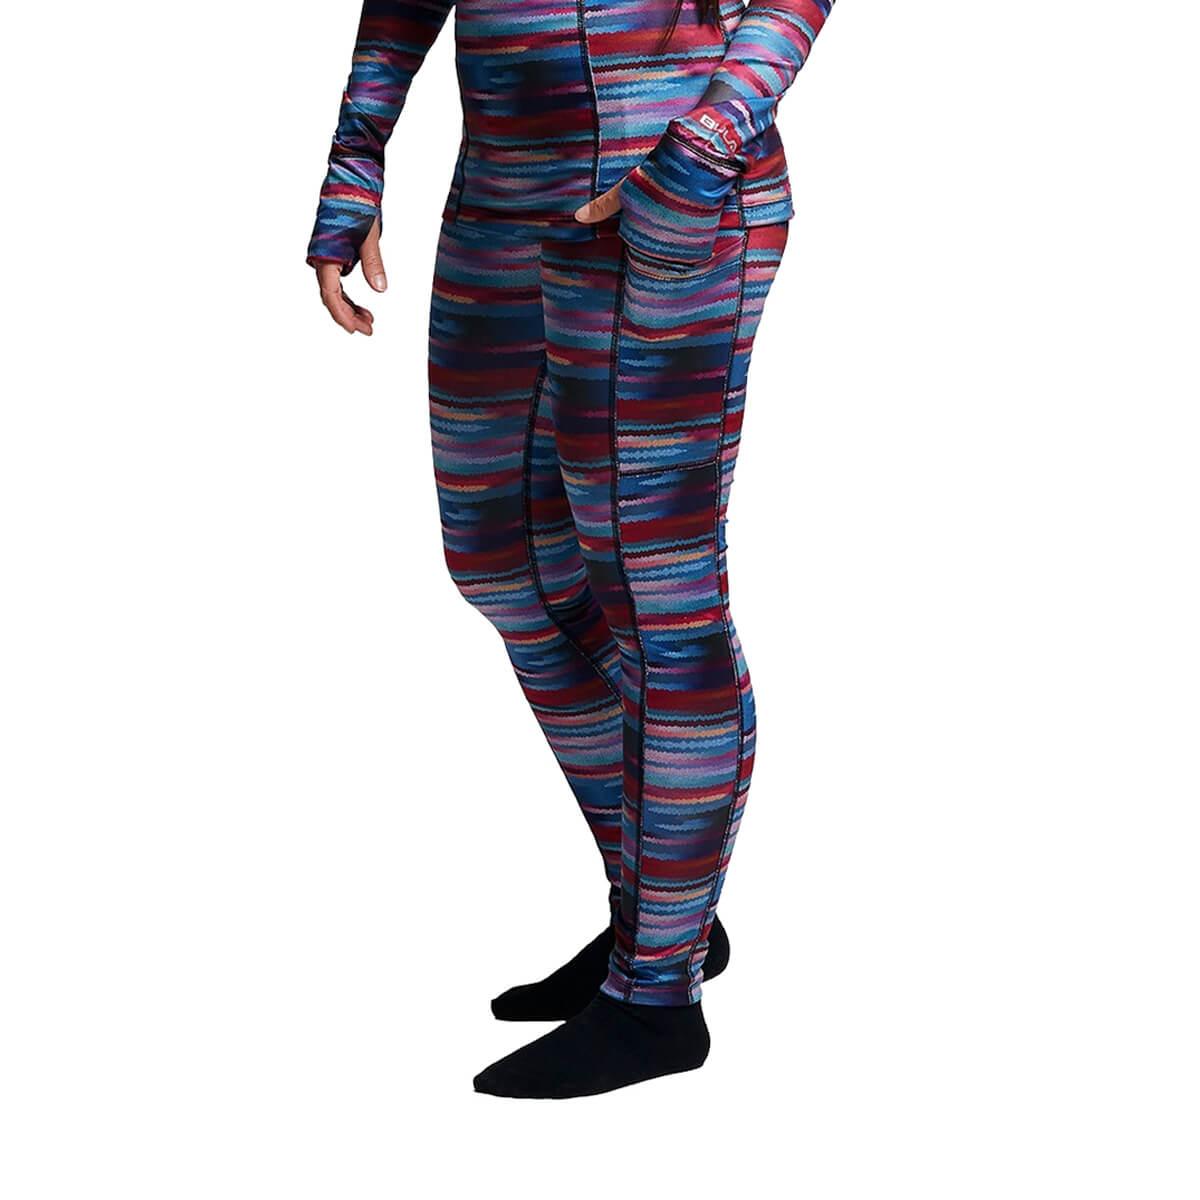 Women's Base Layer Pant - Jazzy